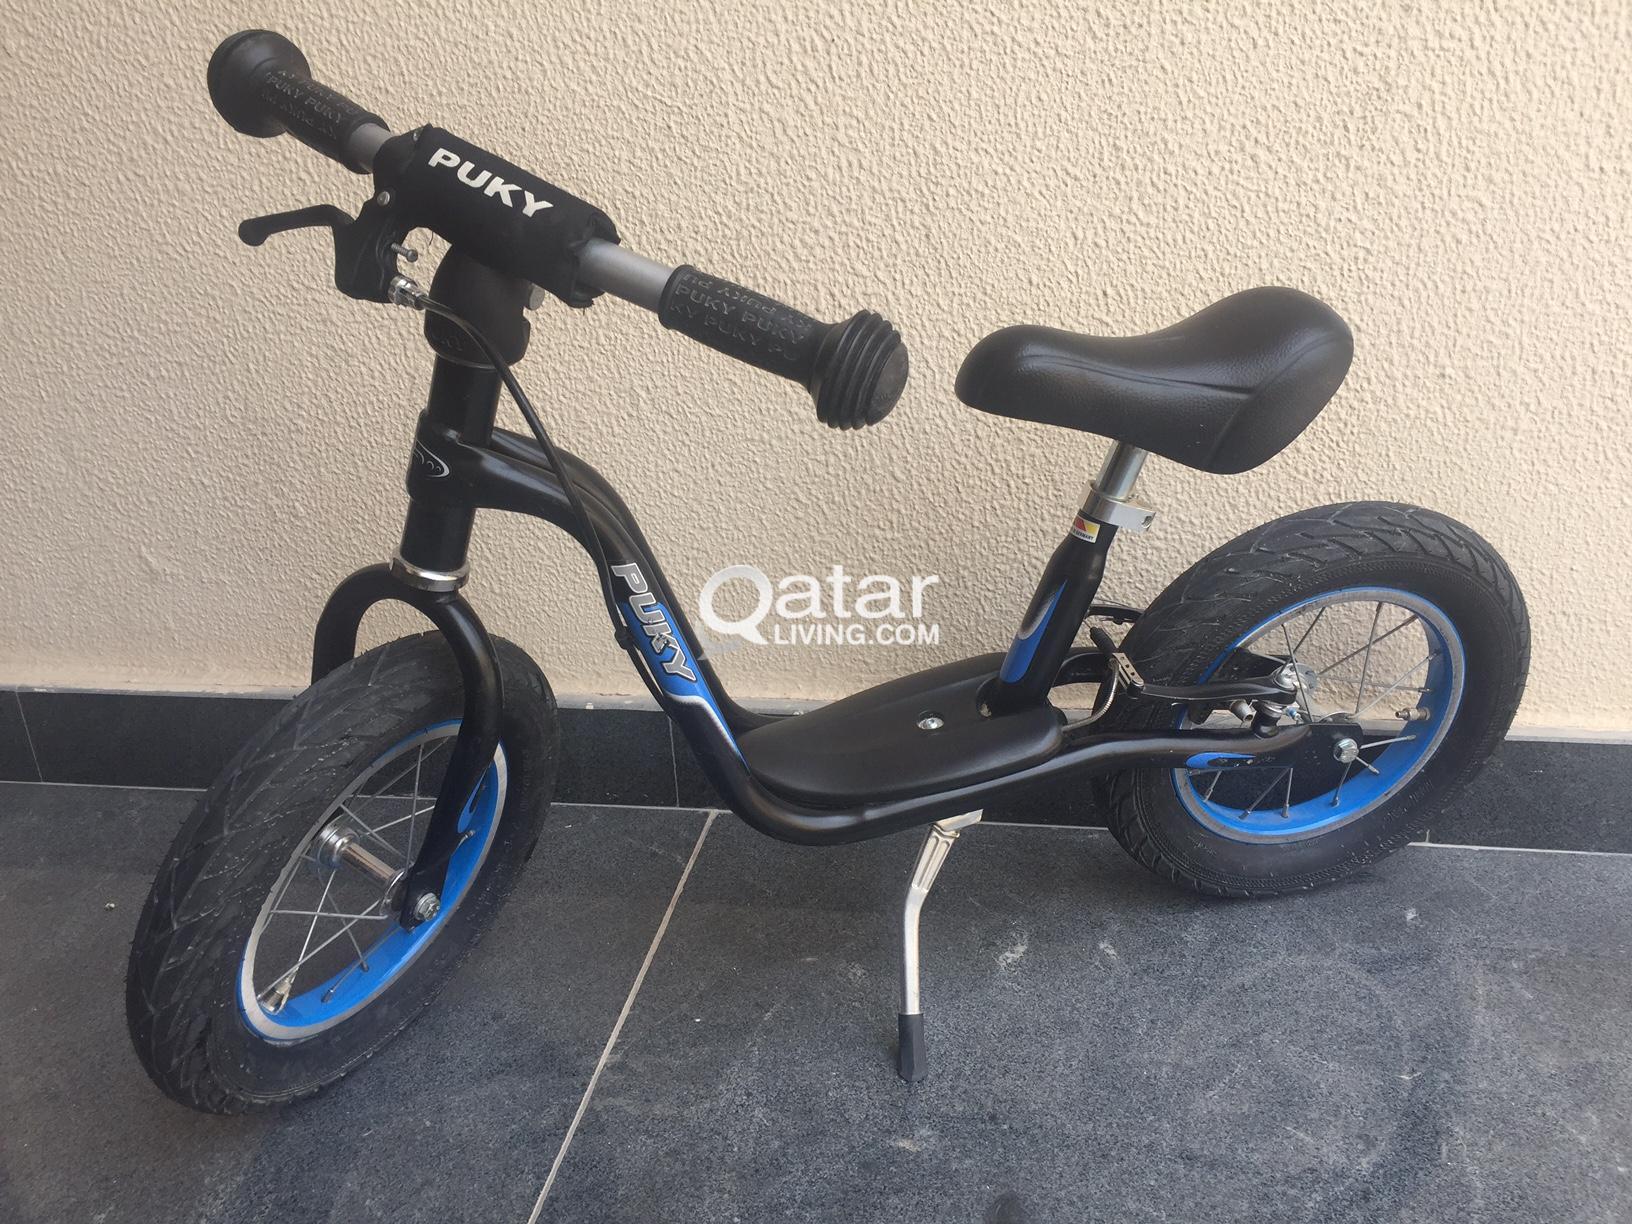 9dc6625bb93 Puky german made balance bike with brake   Qatar Living